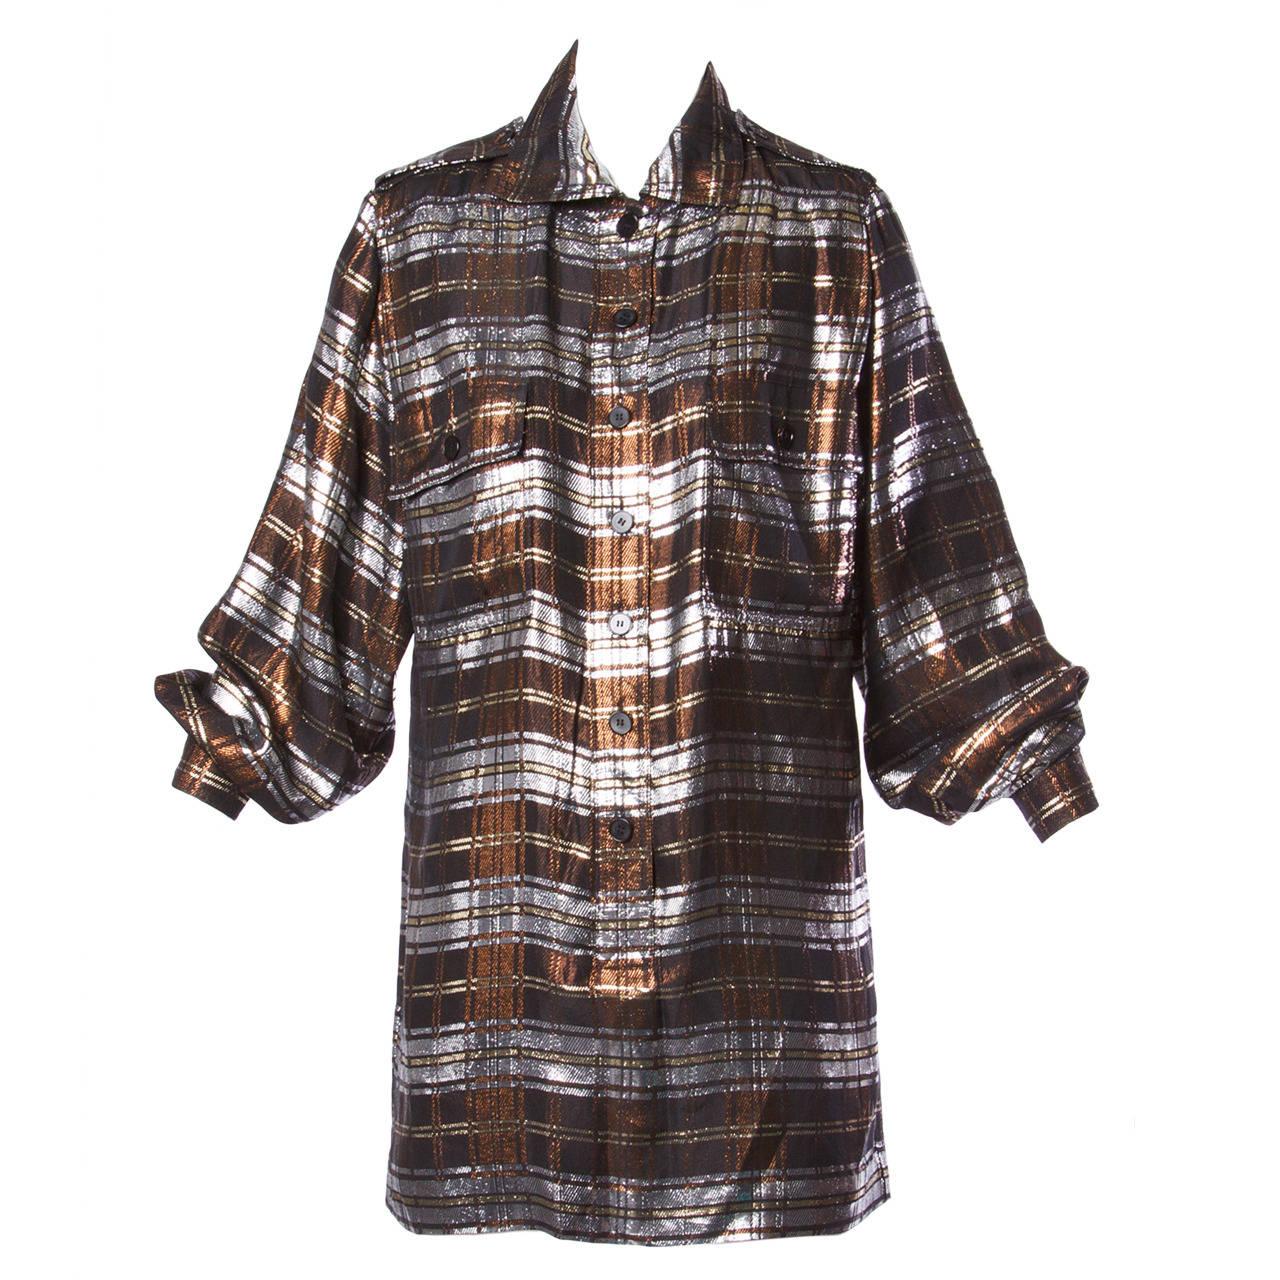 Jean Louis Scherrer Vintage 1980s Metallic Silk Plaid Shirt Dress or Tunic